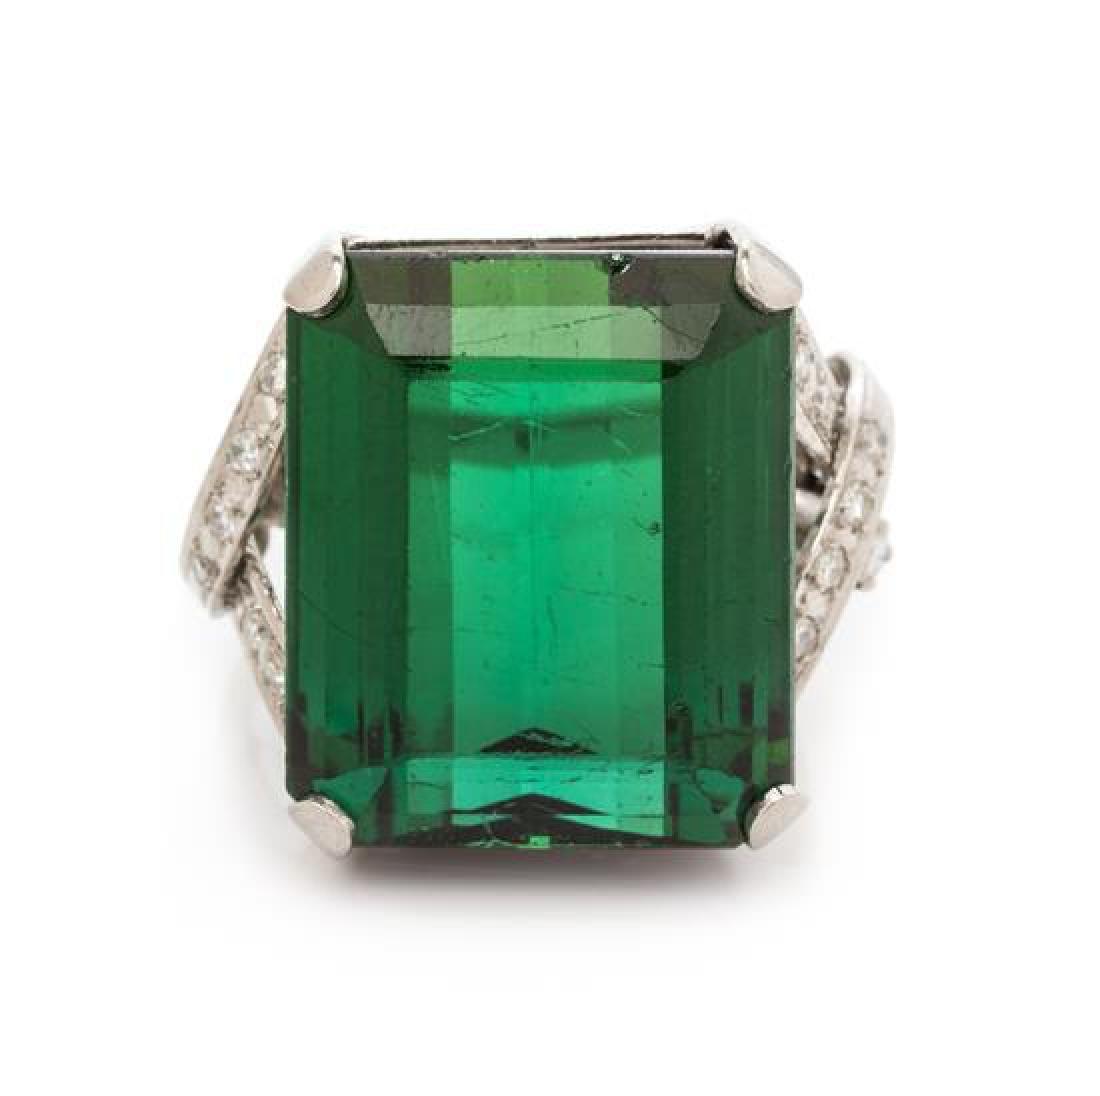 A Platinum, Green Tourmaline and Diamond Ring, 13.25